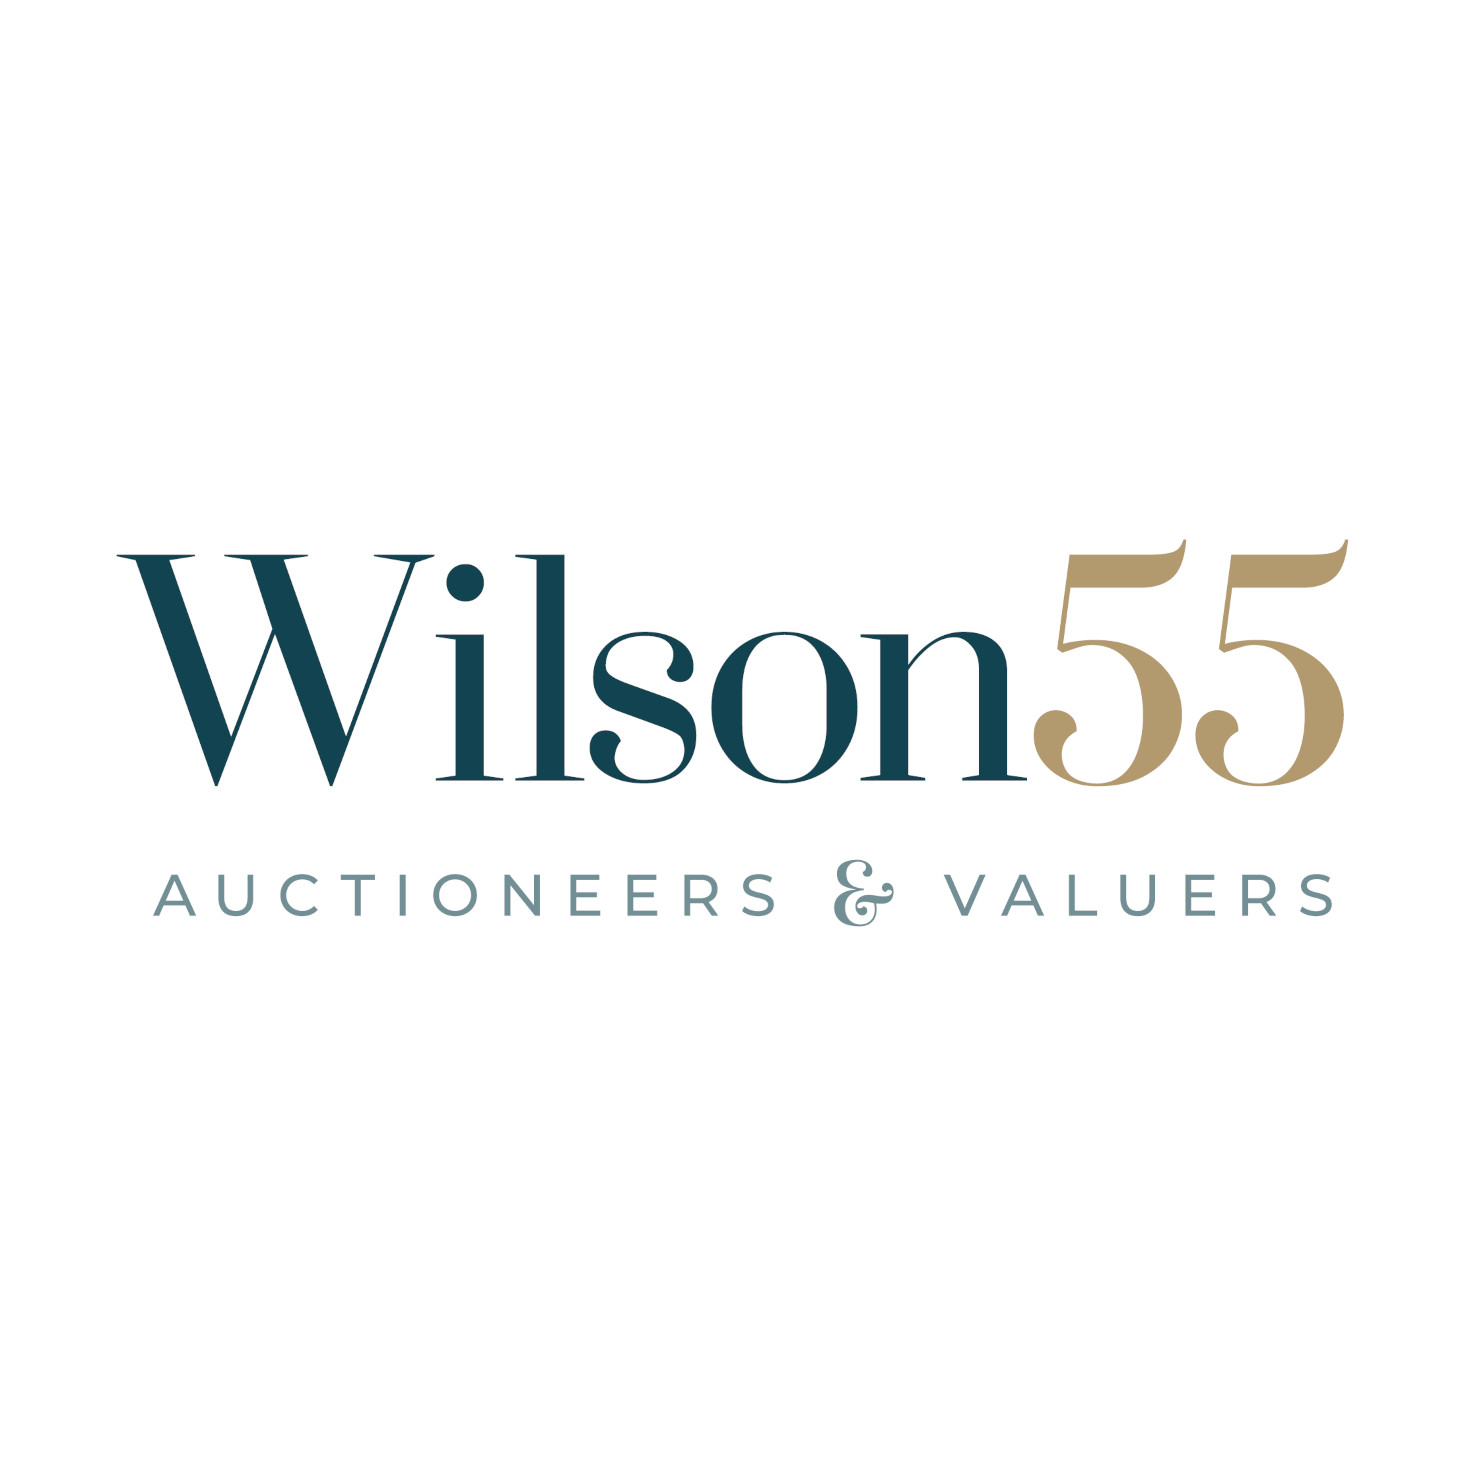 Introducing Wilson55.com